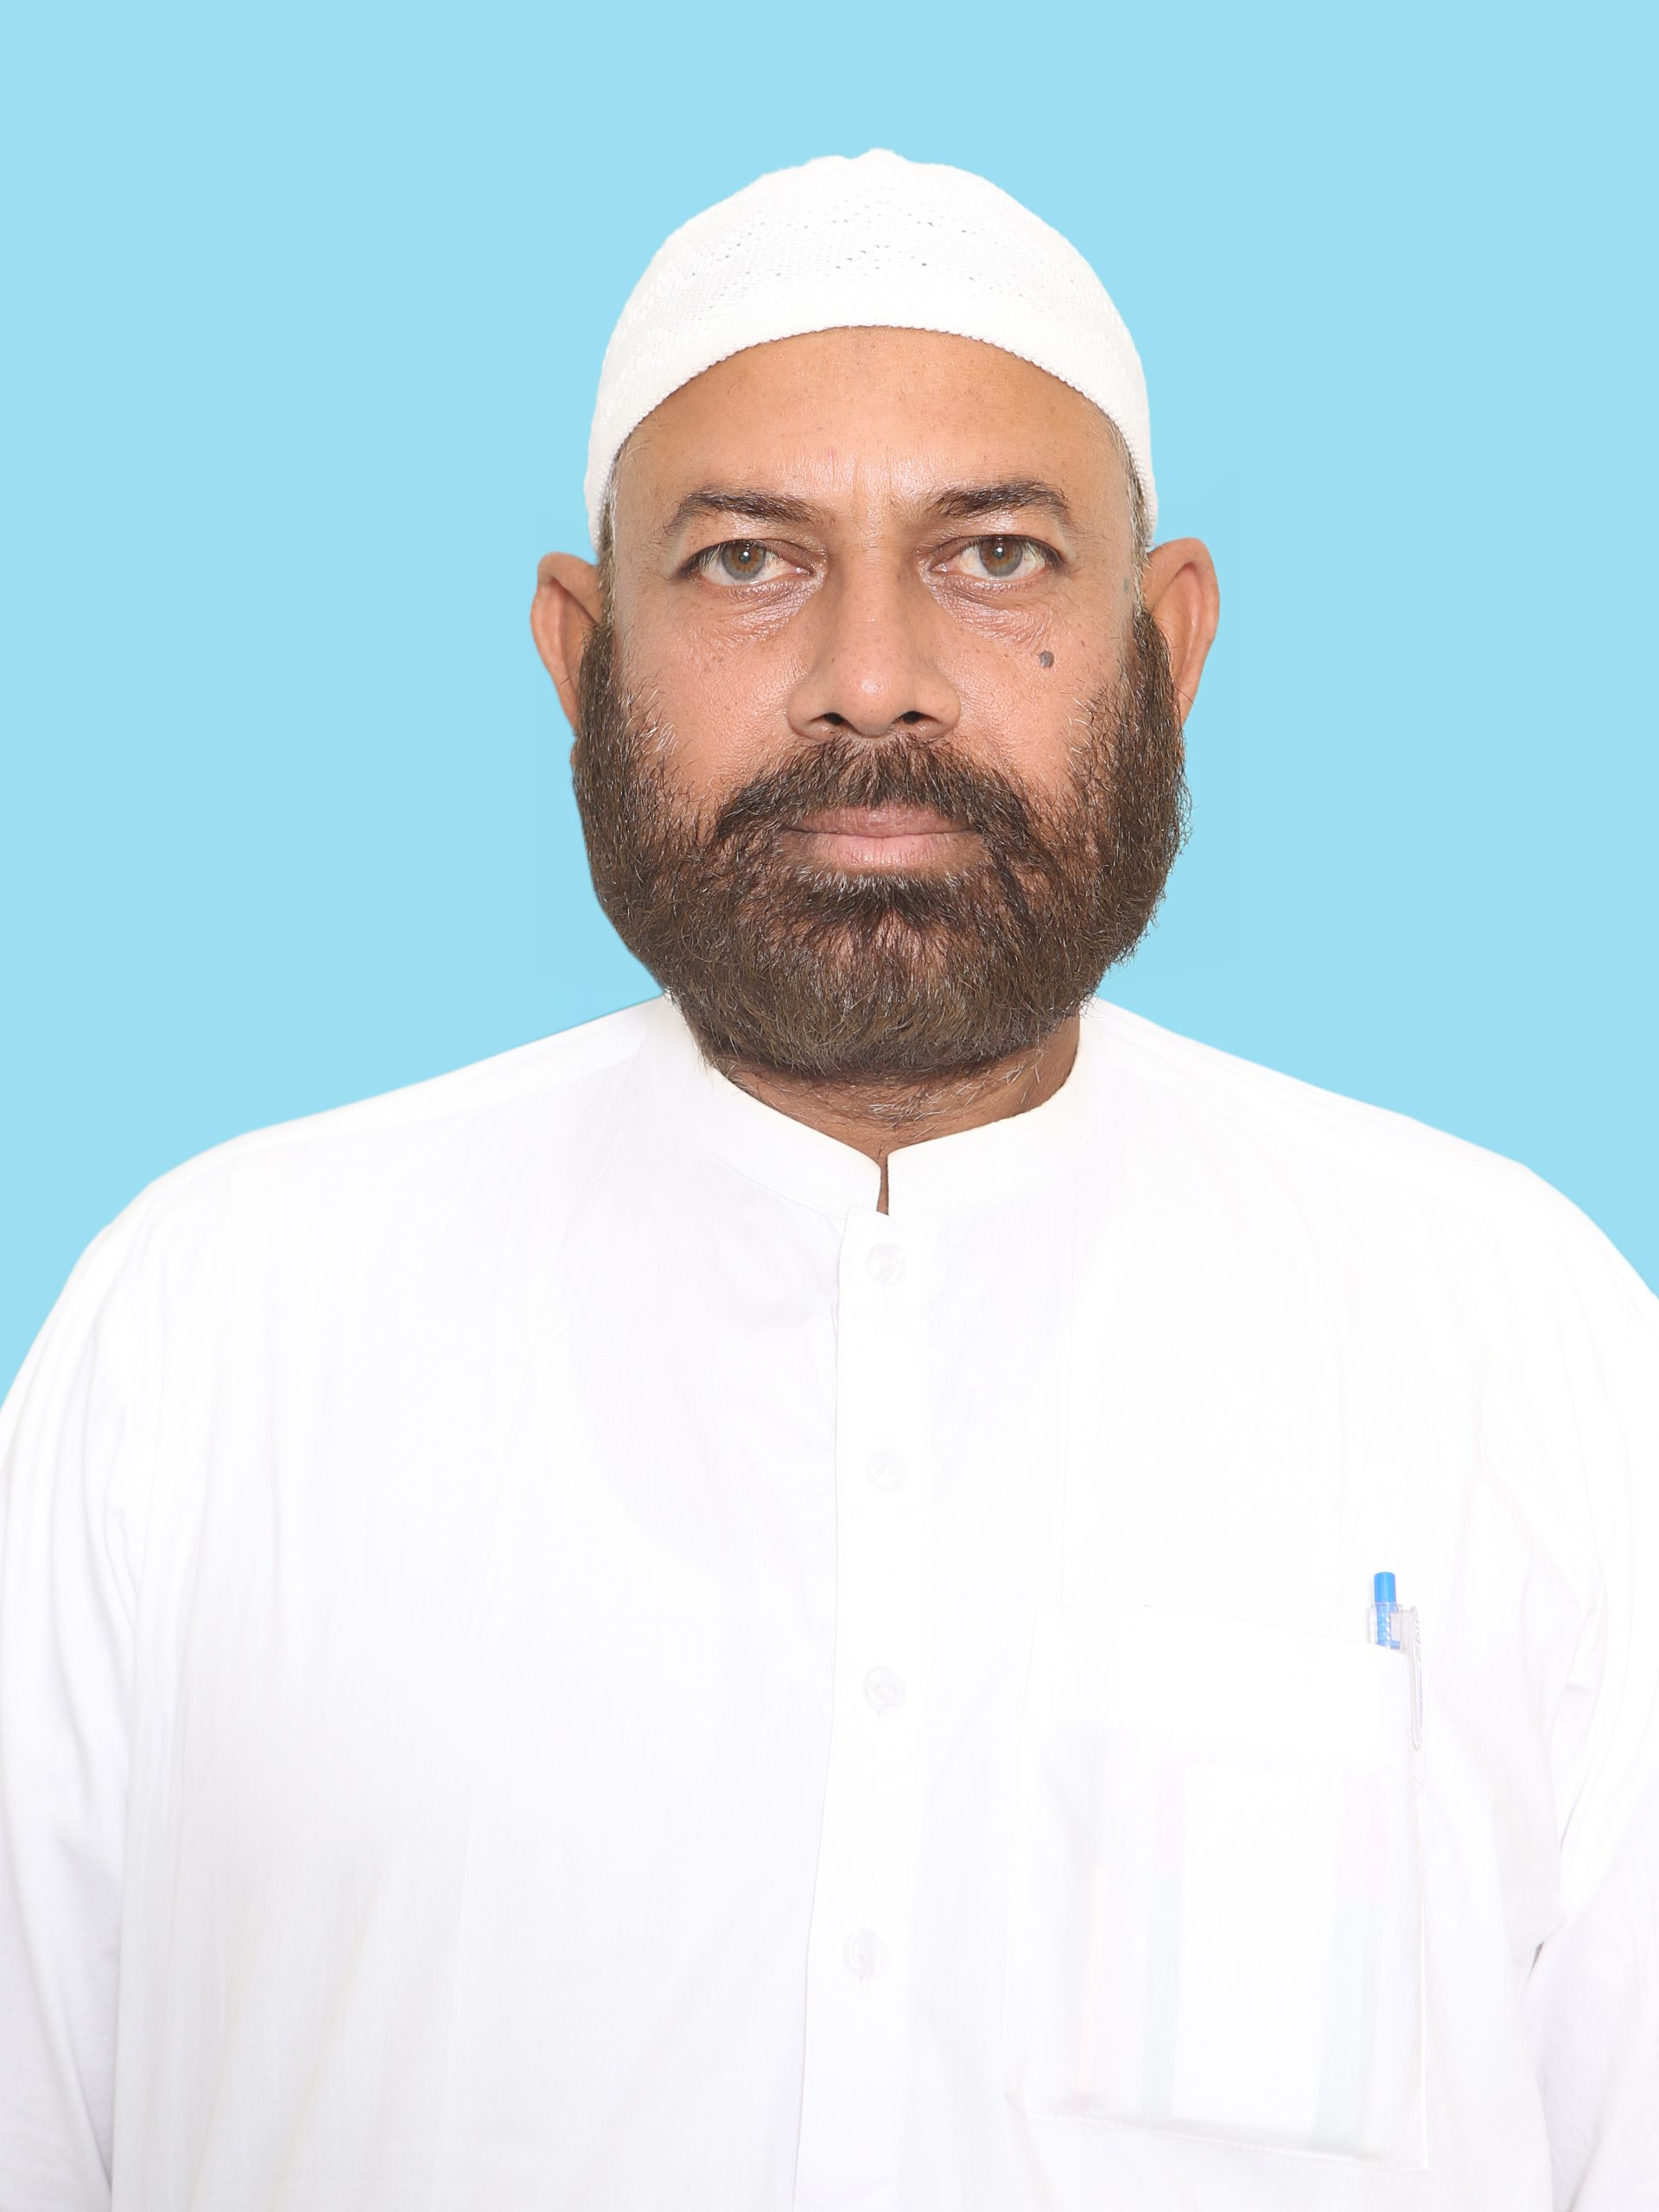 Aijaz Hussain